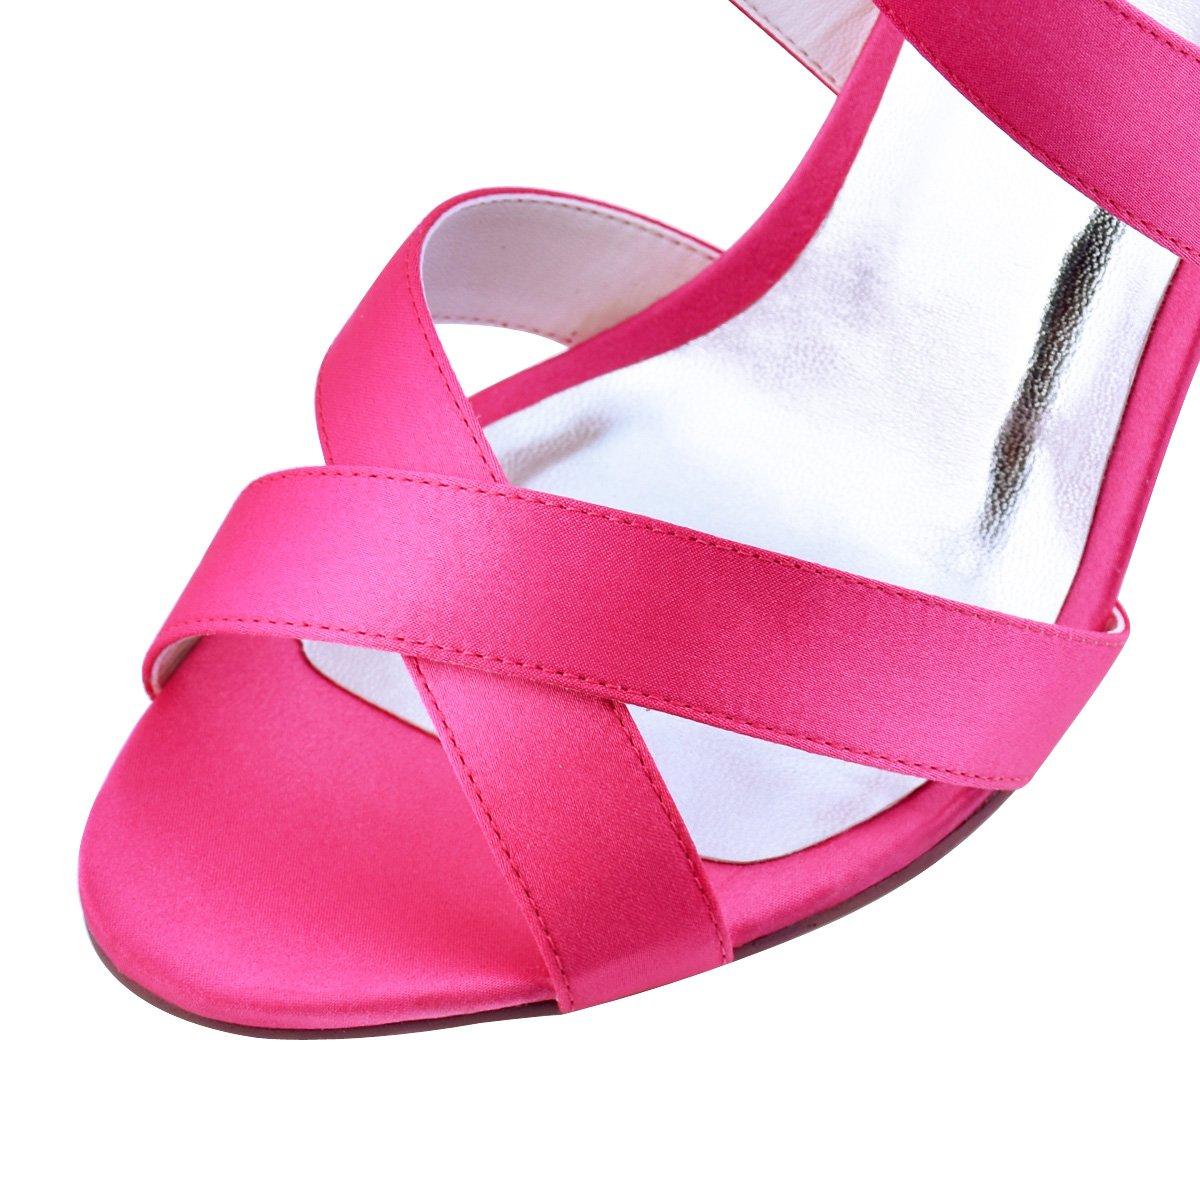 ElegantPark mujeres cruzada zapatos de 5774 correa tacón alto punta ...